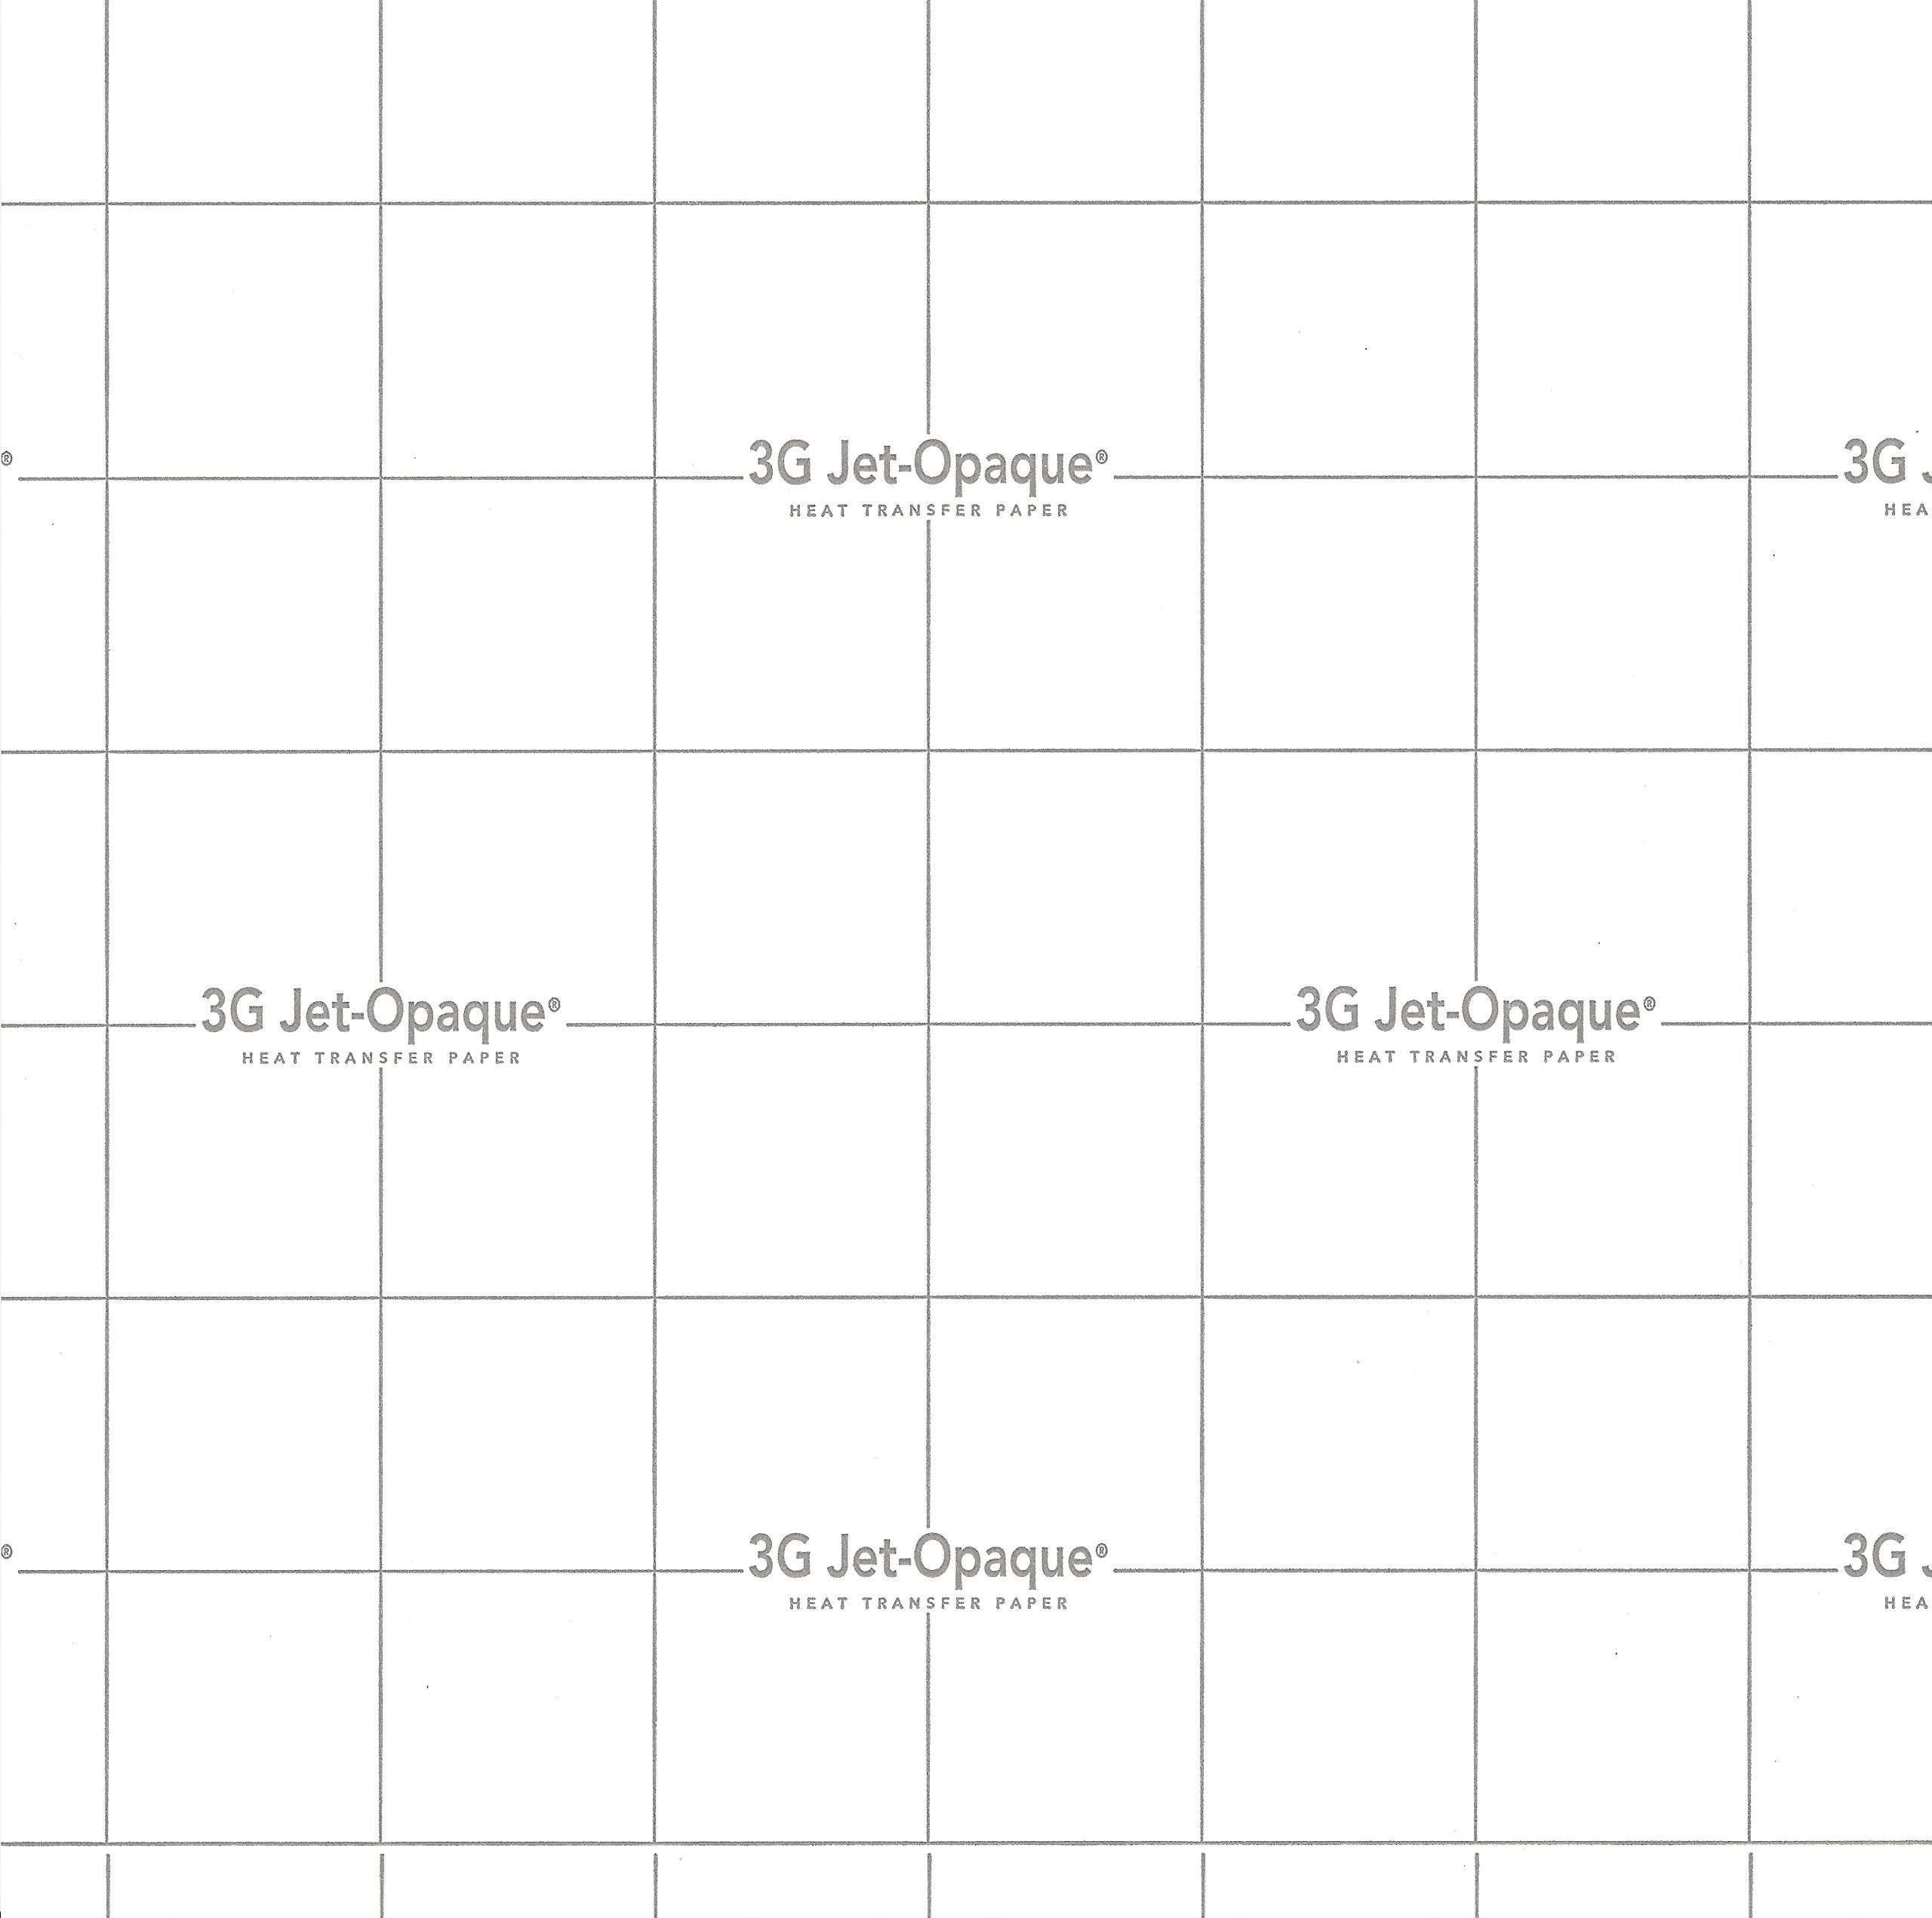 Inkjet Opaque Heat Transfer Paper - 3G Jet Opaque - 8.5'' X 11'', 50 Sheets by Neenah